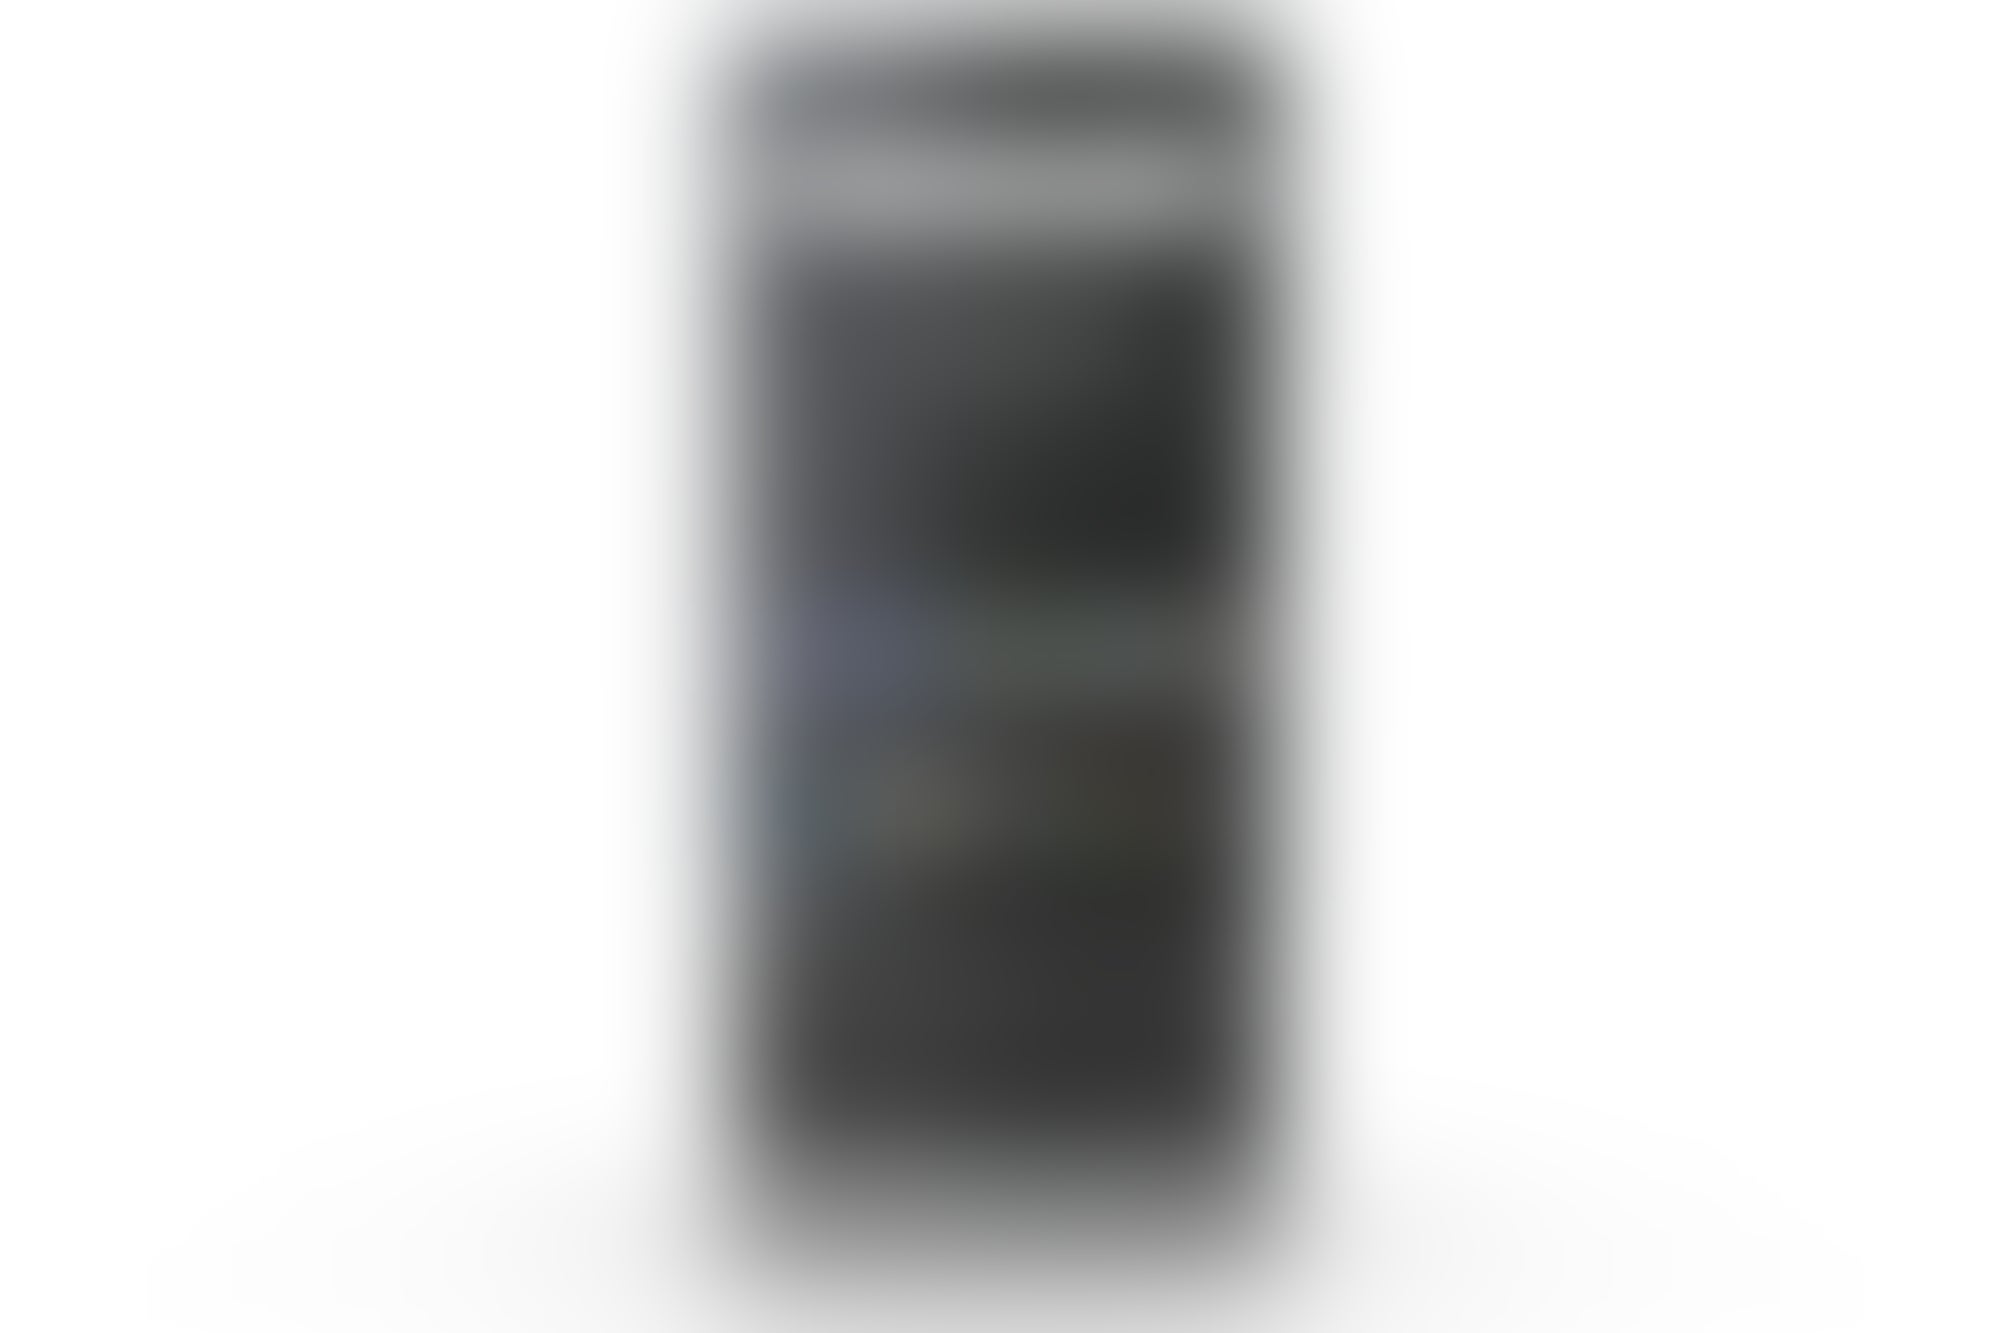 Locked And Loaded: BlackBerry KEY2